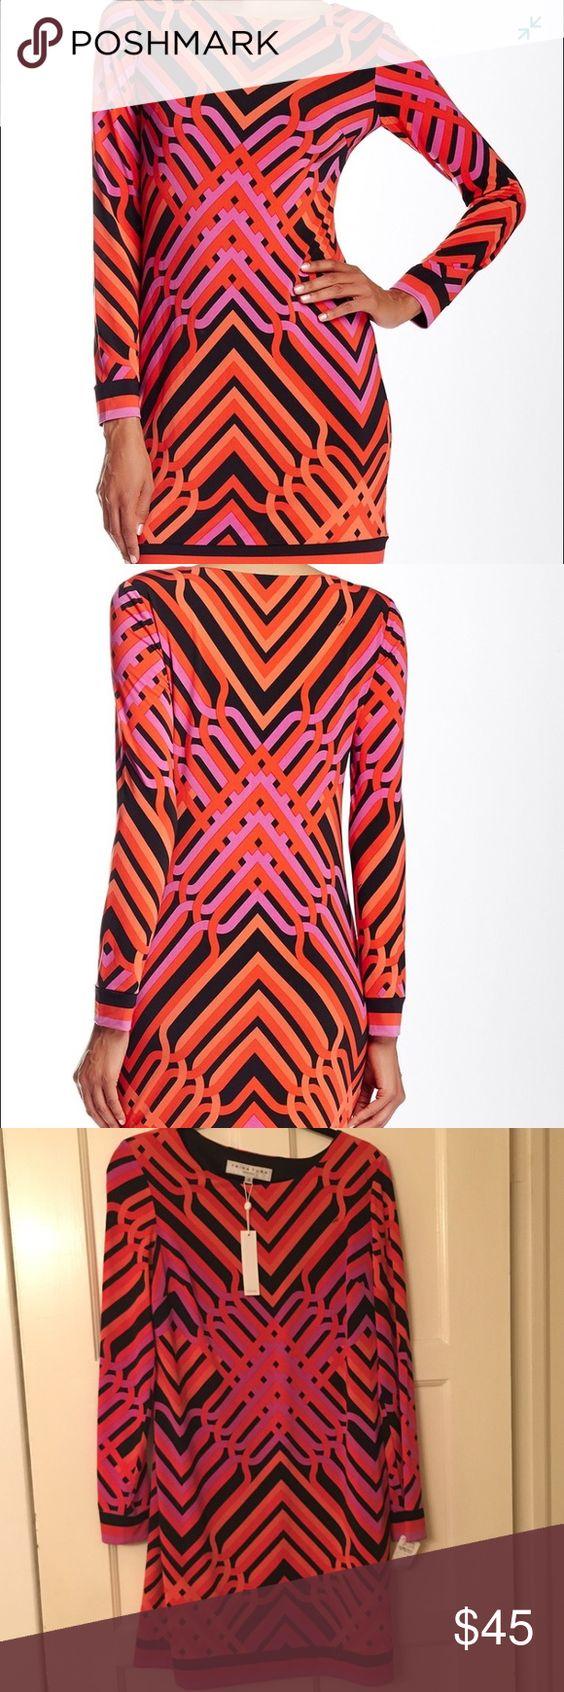 Selling this Trina Turk Long Sleeve Geo Matte Jersey Dress on Poshmark! My username is: jennyla2. #shopmycloset #poshmark #fashion #shopping #style #forsale #Trina Turk #Dresses & Skirts